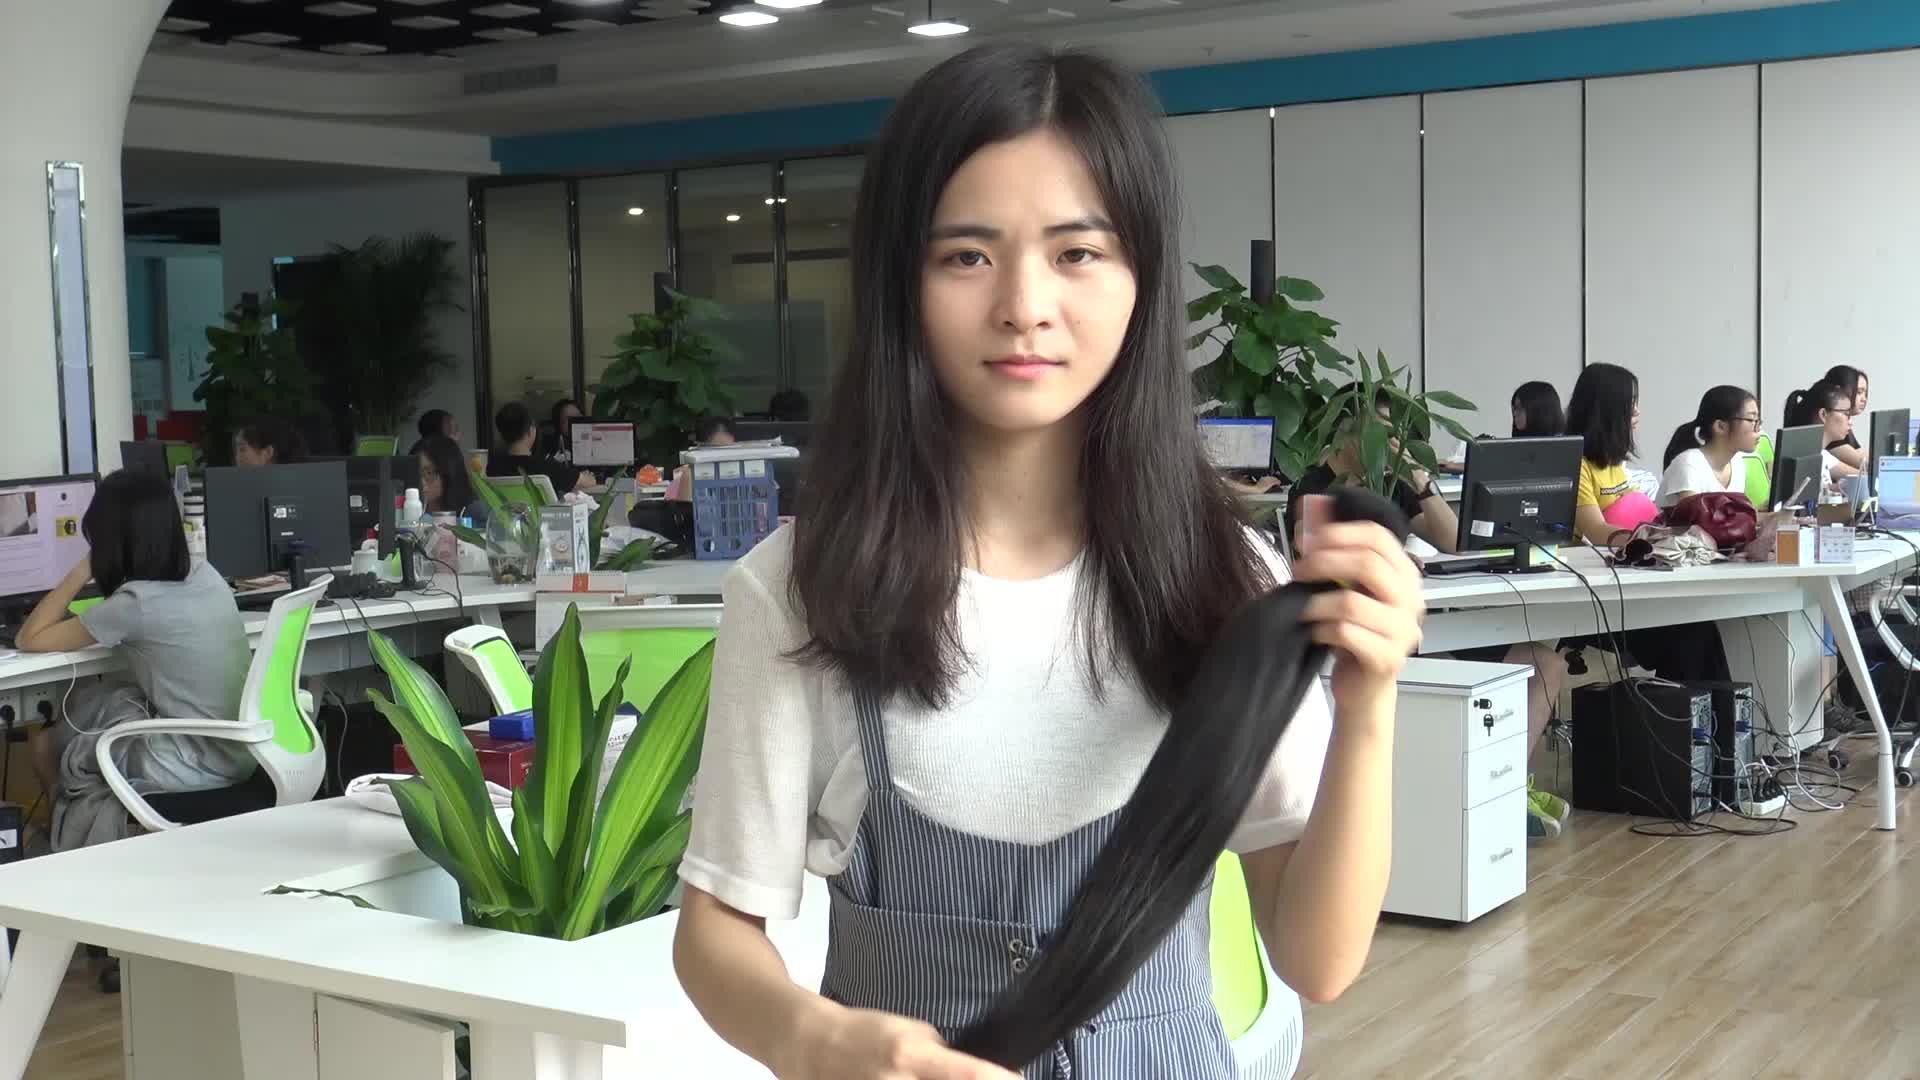 KBL 100% human hair virgin malaysian hair, grade 9a virgin hair weft, natural hair free sample hair bundles